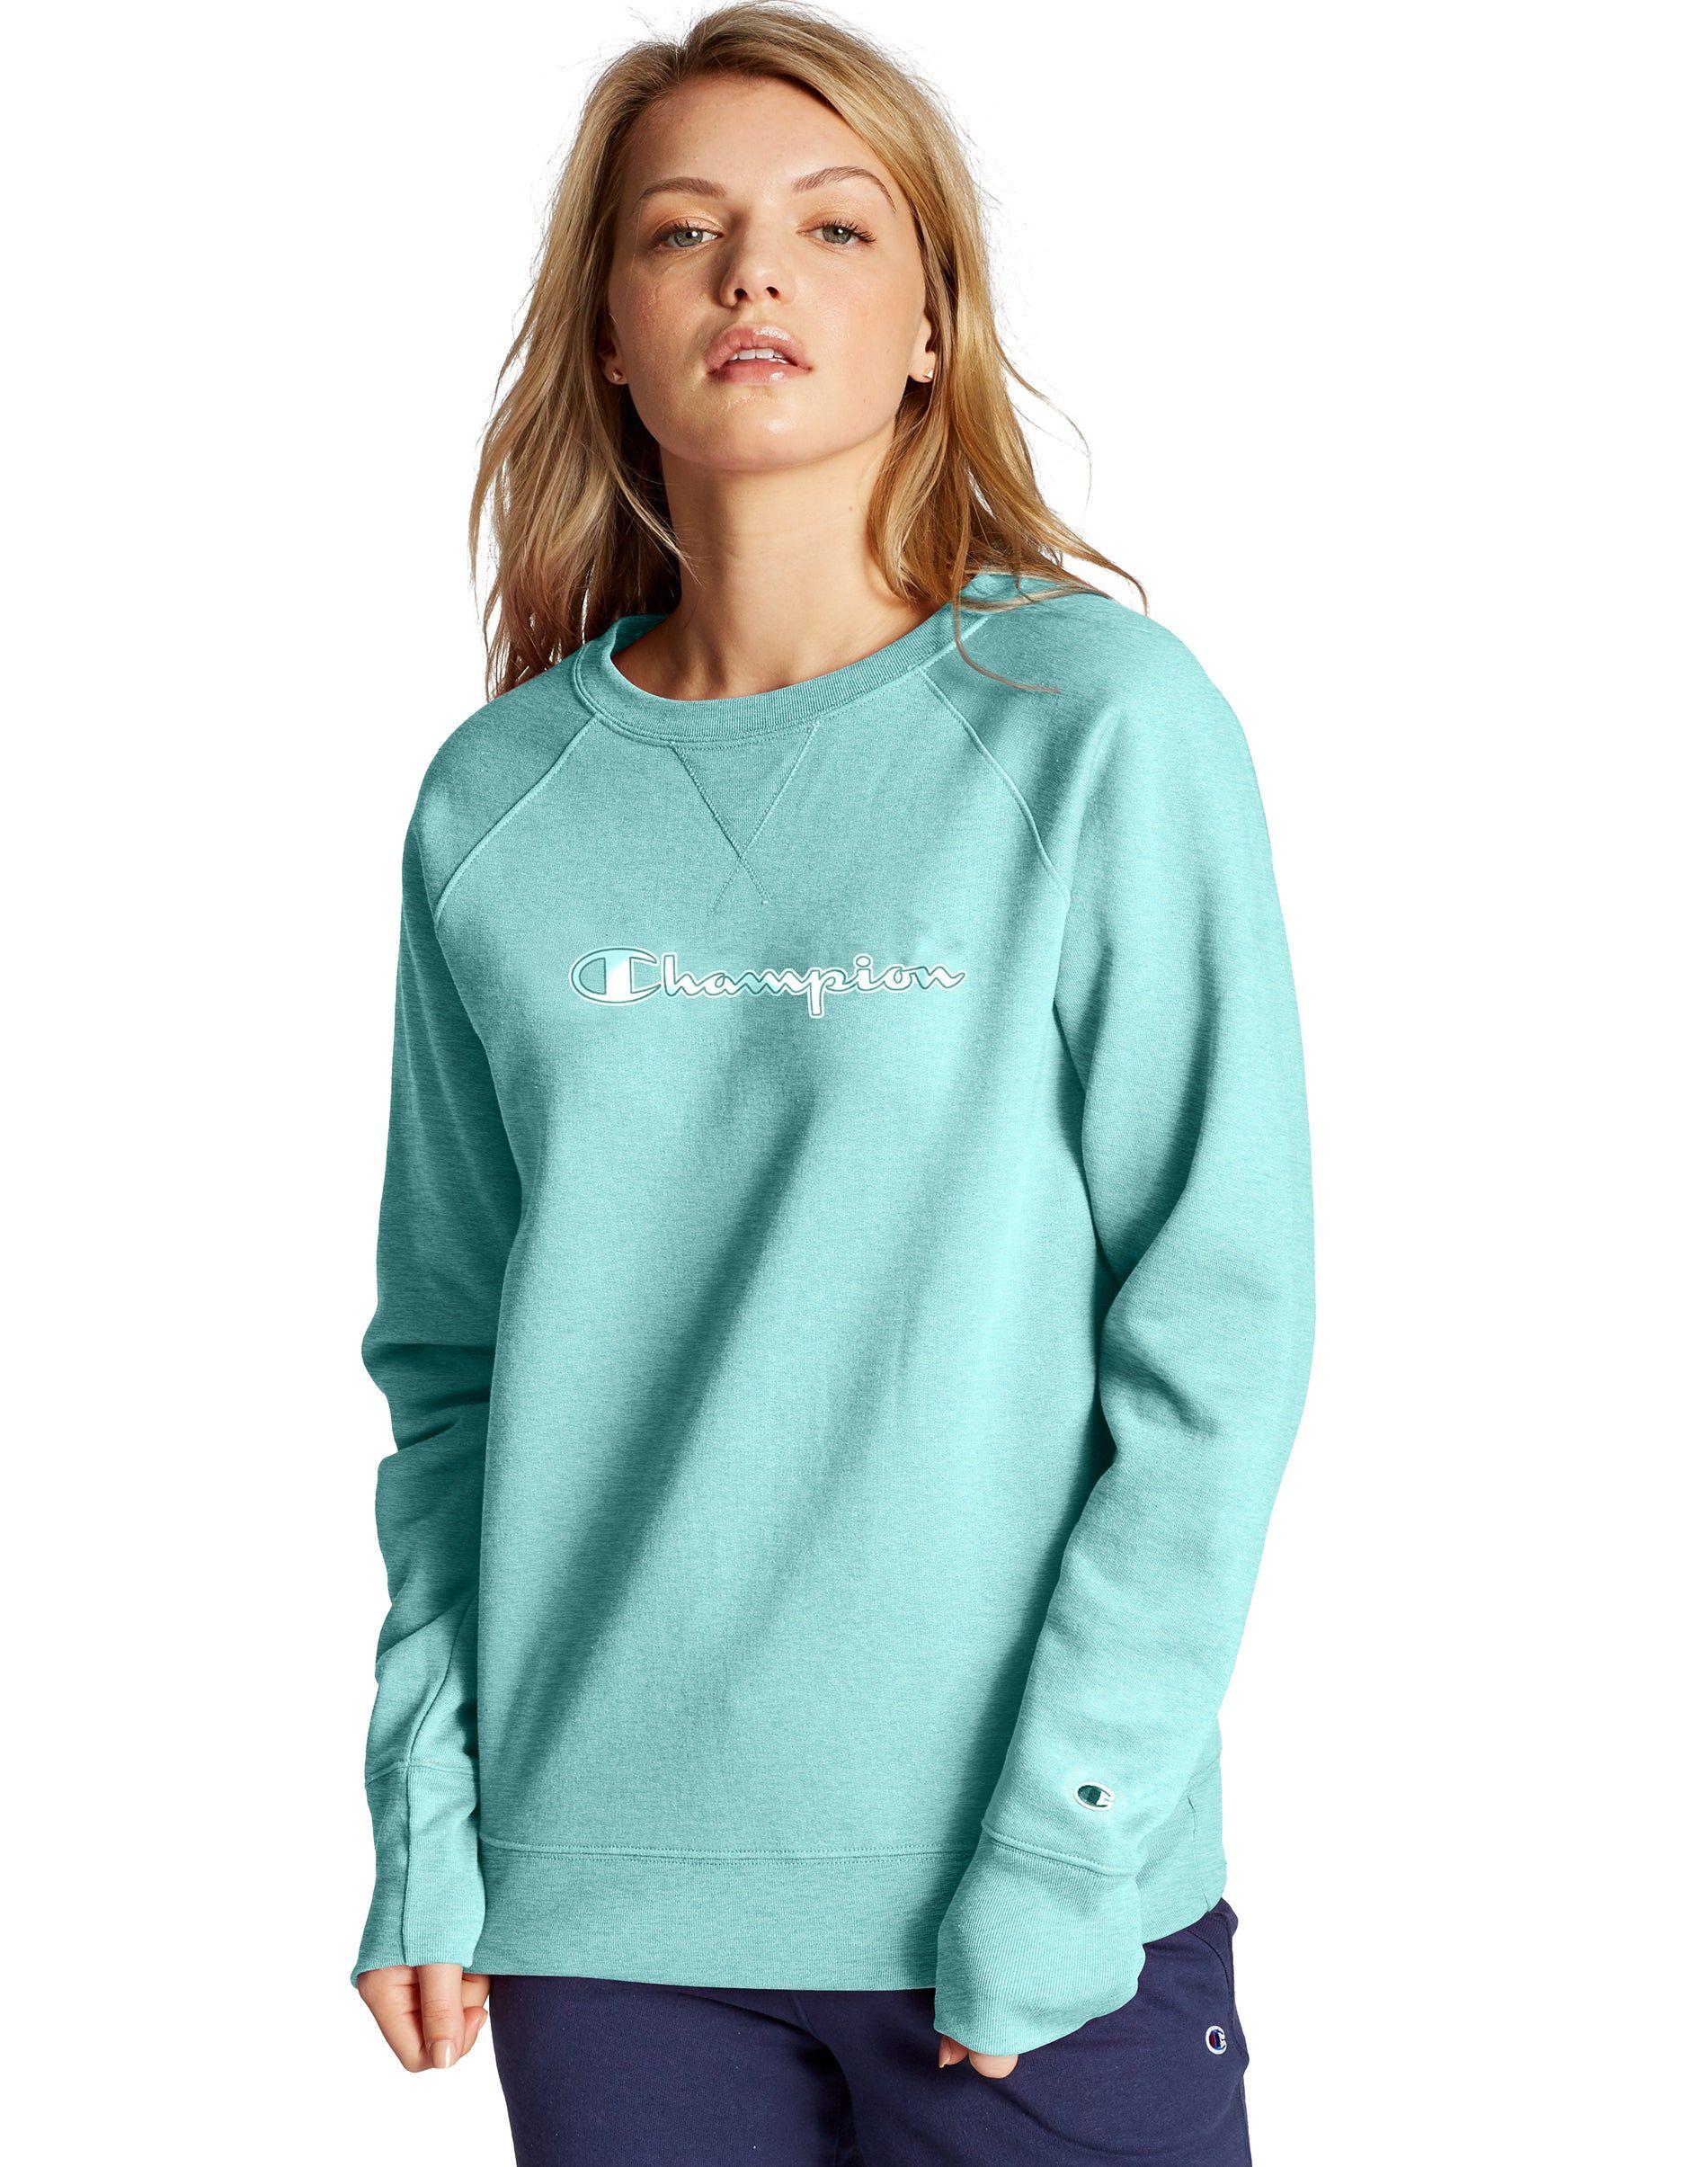 Champion Women S Athletics Powerblend Fleece Crew Chainstitch Logo Amazing Aqua S 25 00 Was 50 00 Women Champion Hoodie Fashion [ 2410 x 1900 Pixel ]